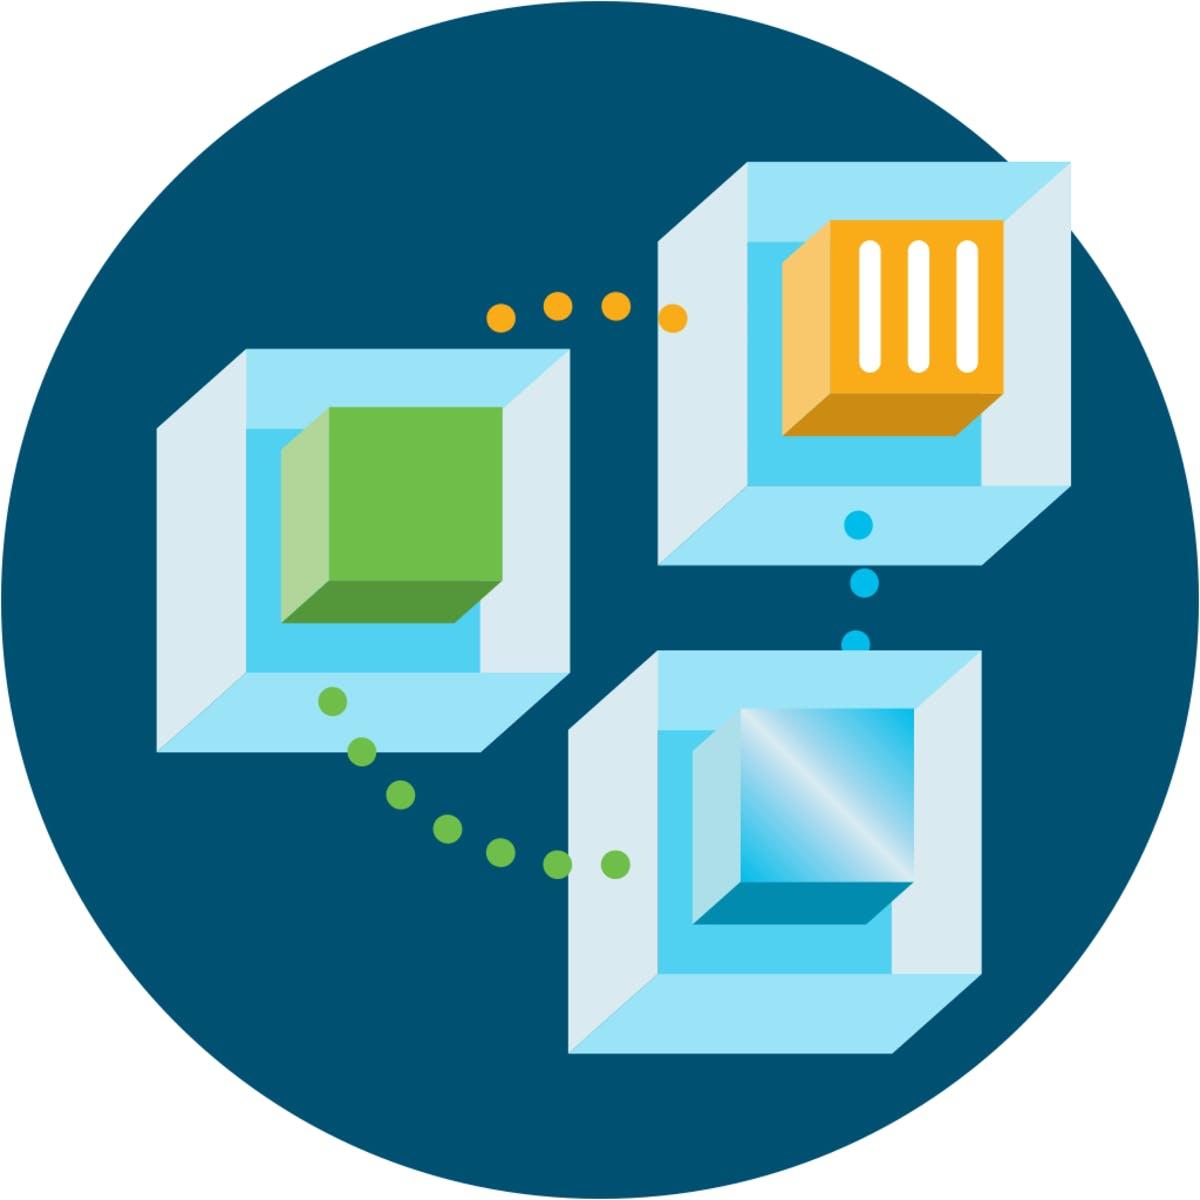 Network Protocols and Architecture | Coursera